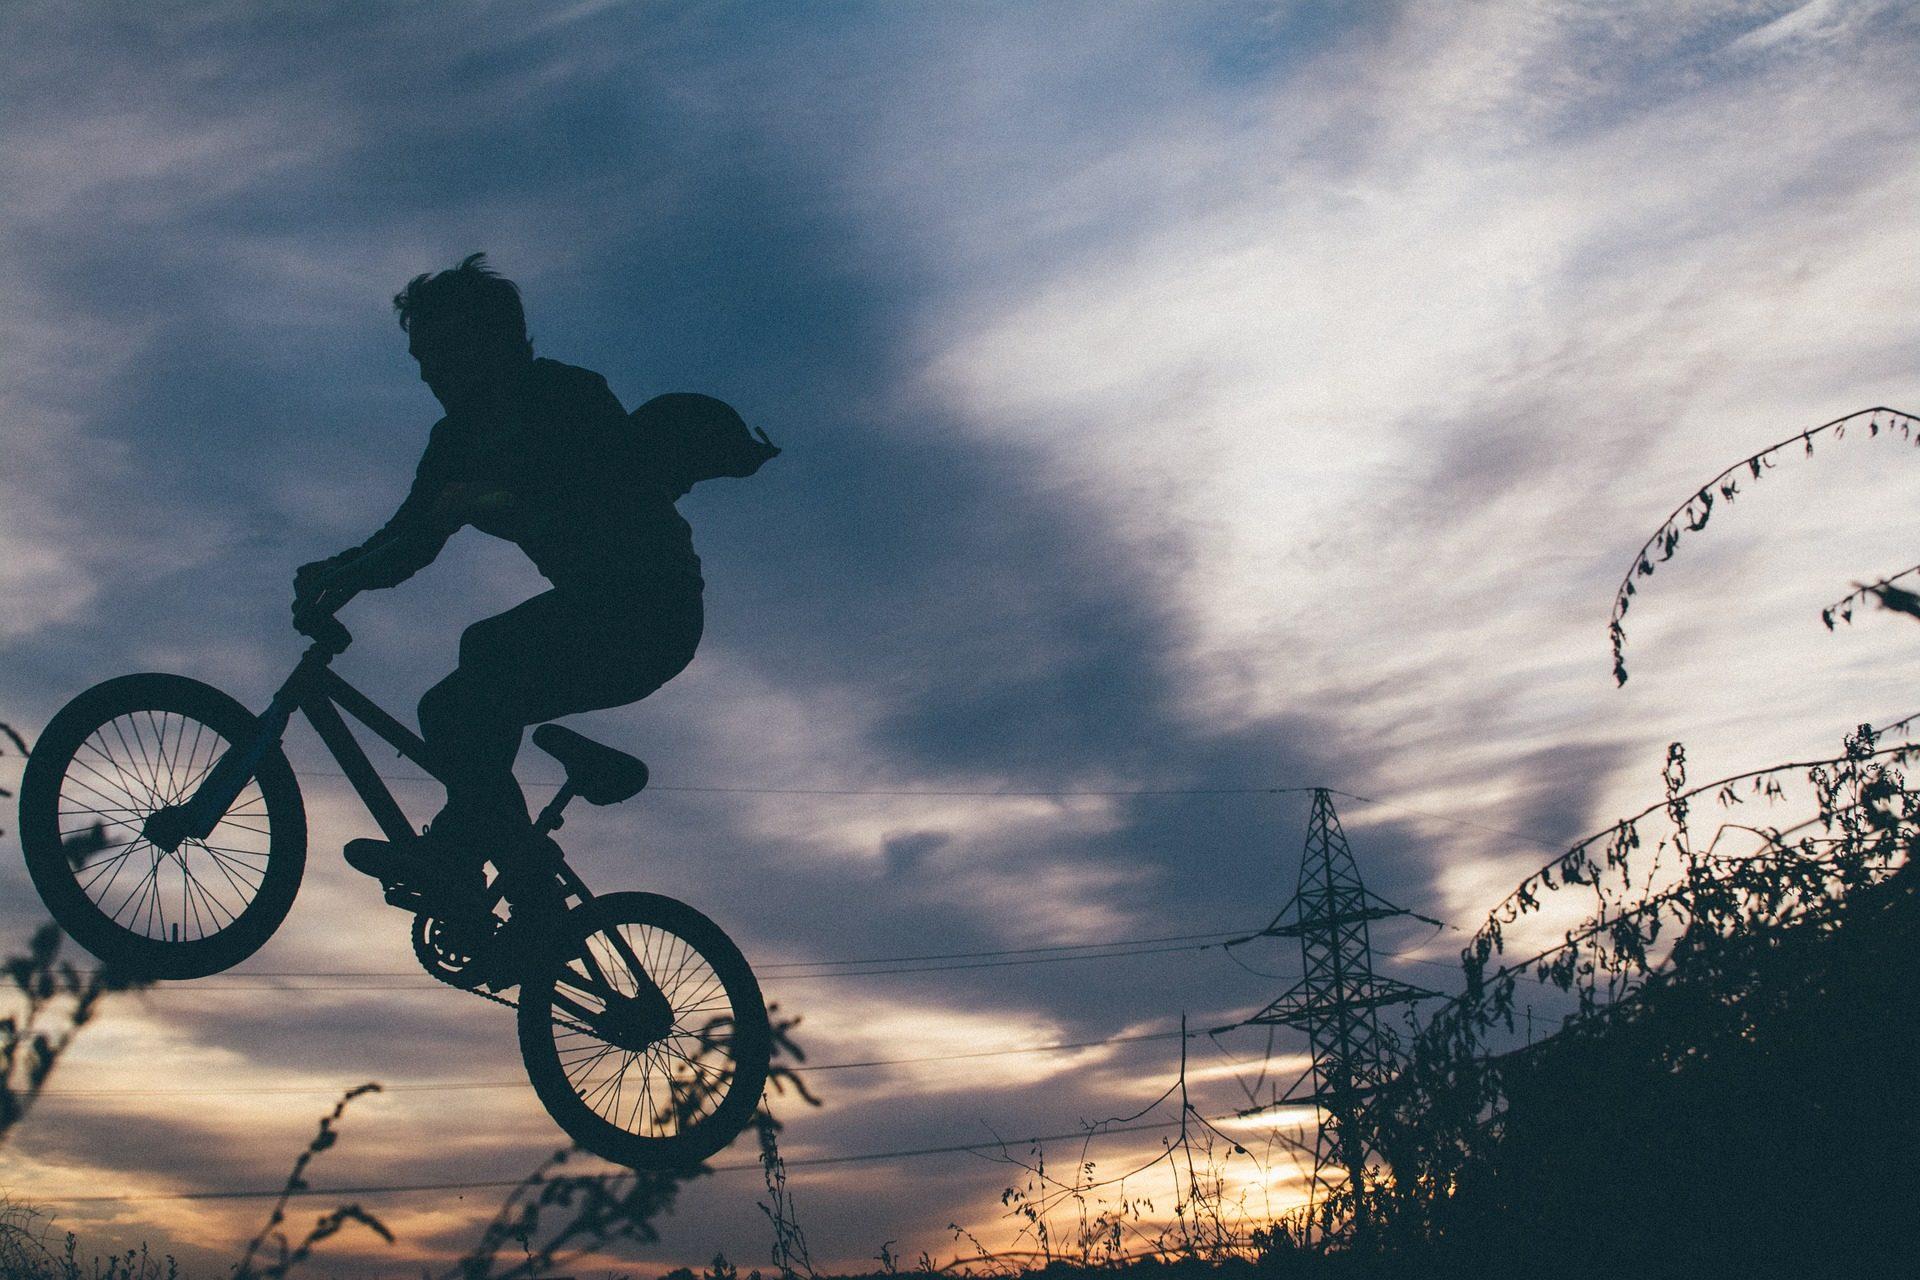 Guy Tapete, Mann, Fahrrad, Springen, Schatten, Risiko   Professor Falken